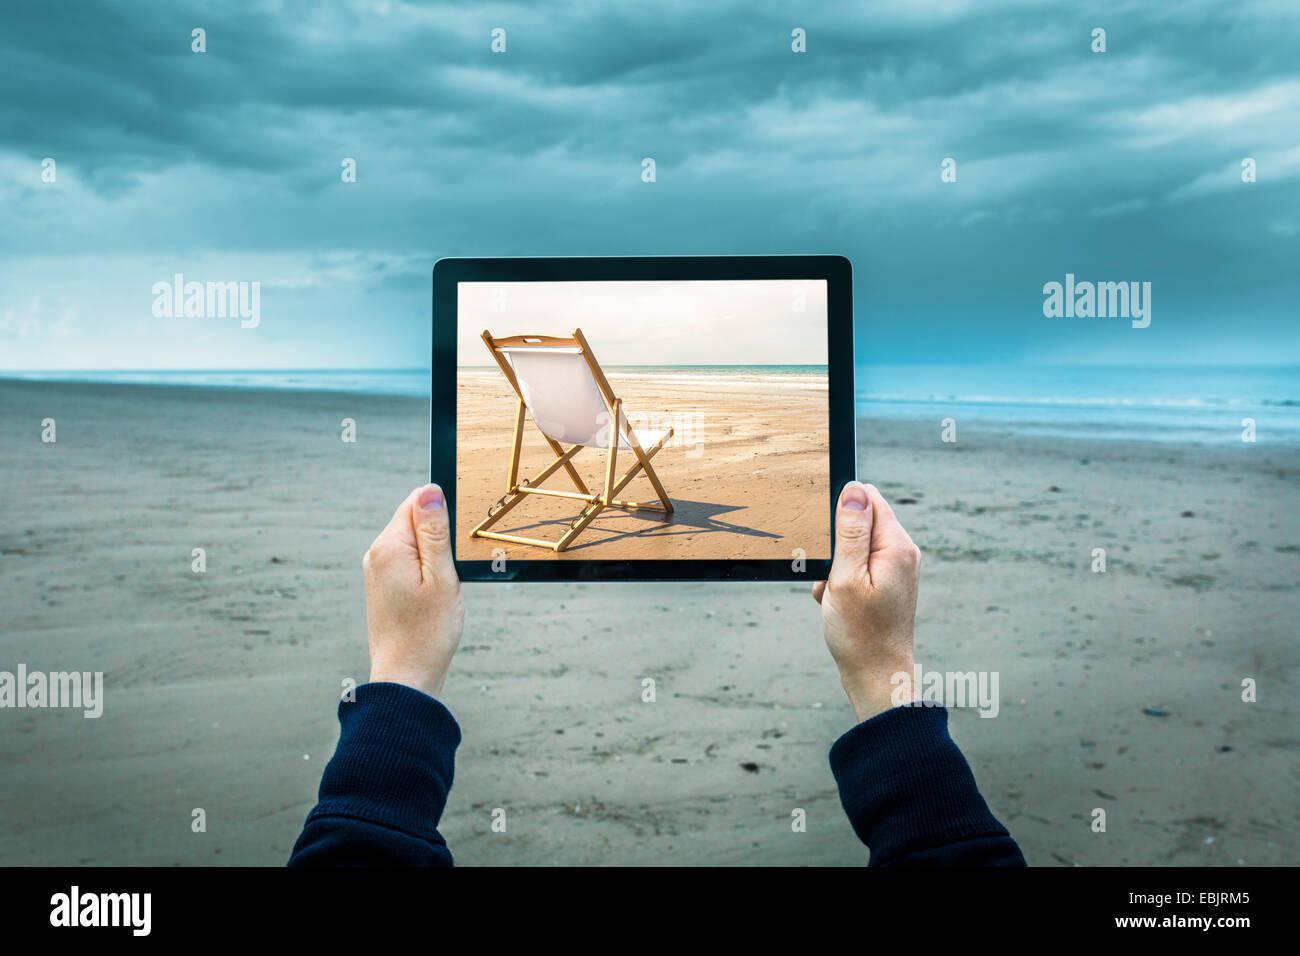 Reife Frau am bewölkten Strand hält digitale Tablet zeigt Sonnenstrand Szene, Fokus auf Hände und Stockbild